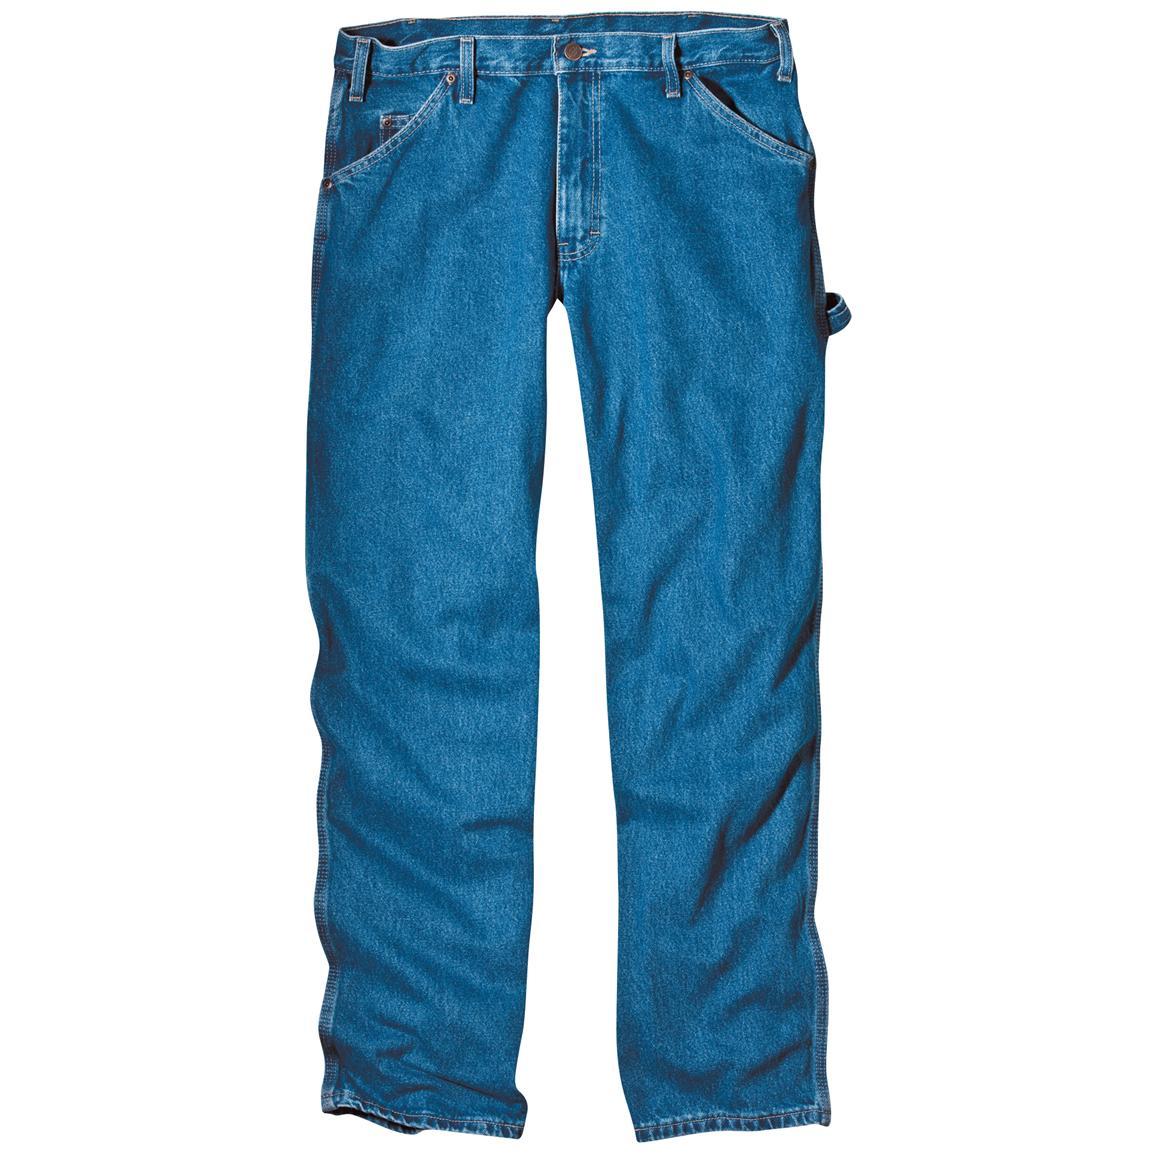 1154x1154 Jeans Clip Art Pictures Free Clipart Panda